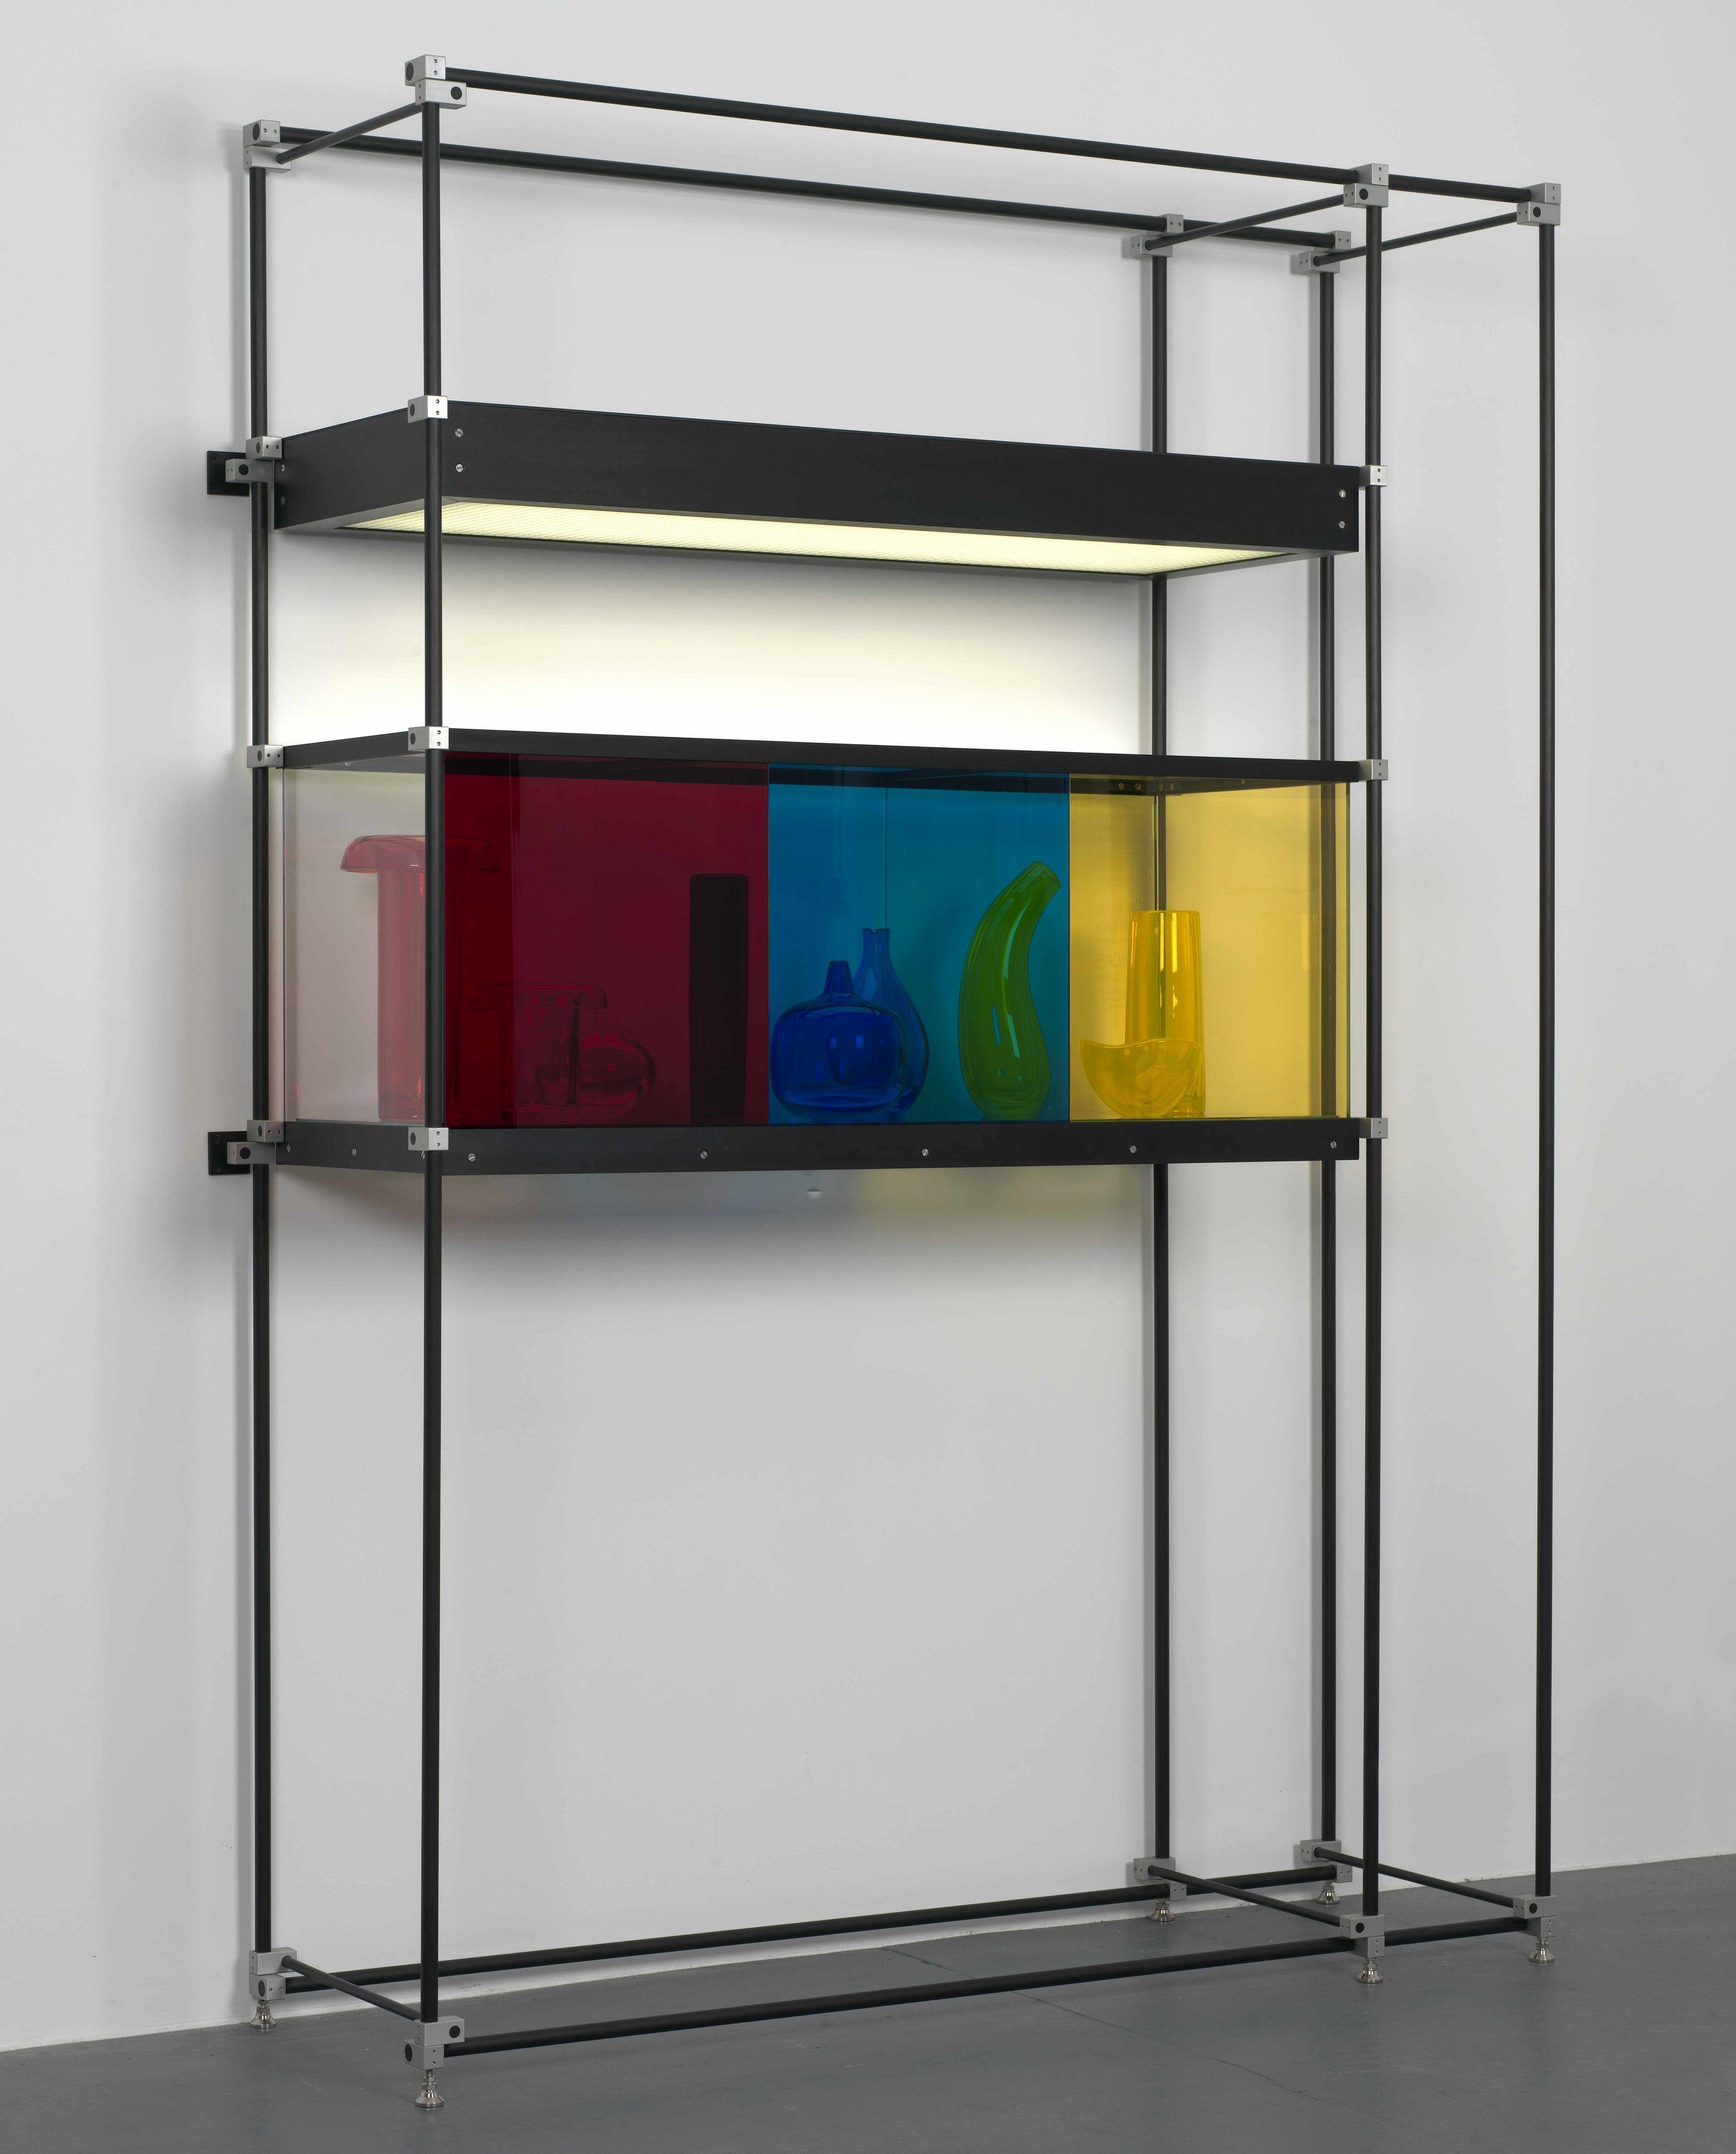 JOSIAH McELHENY, Chromatic Modernism (Red, Blue, Yellow)